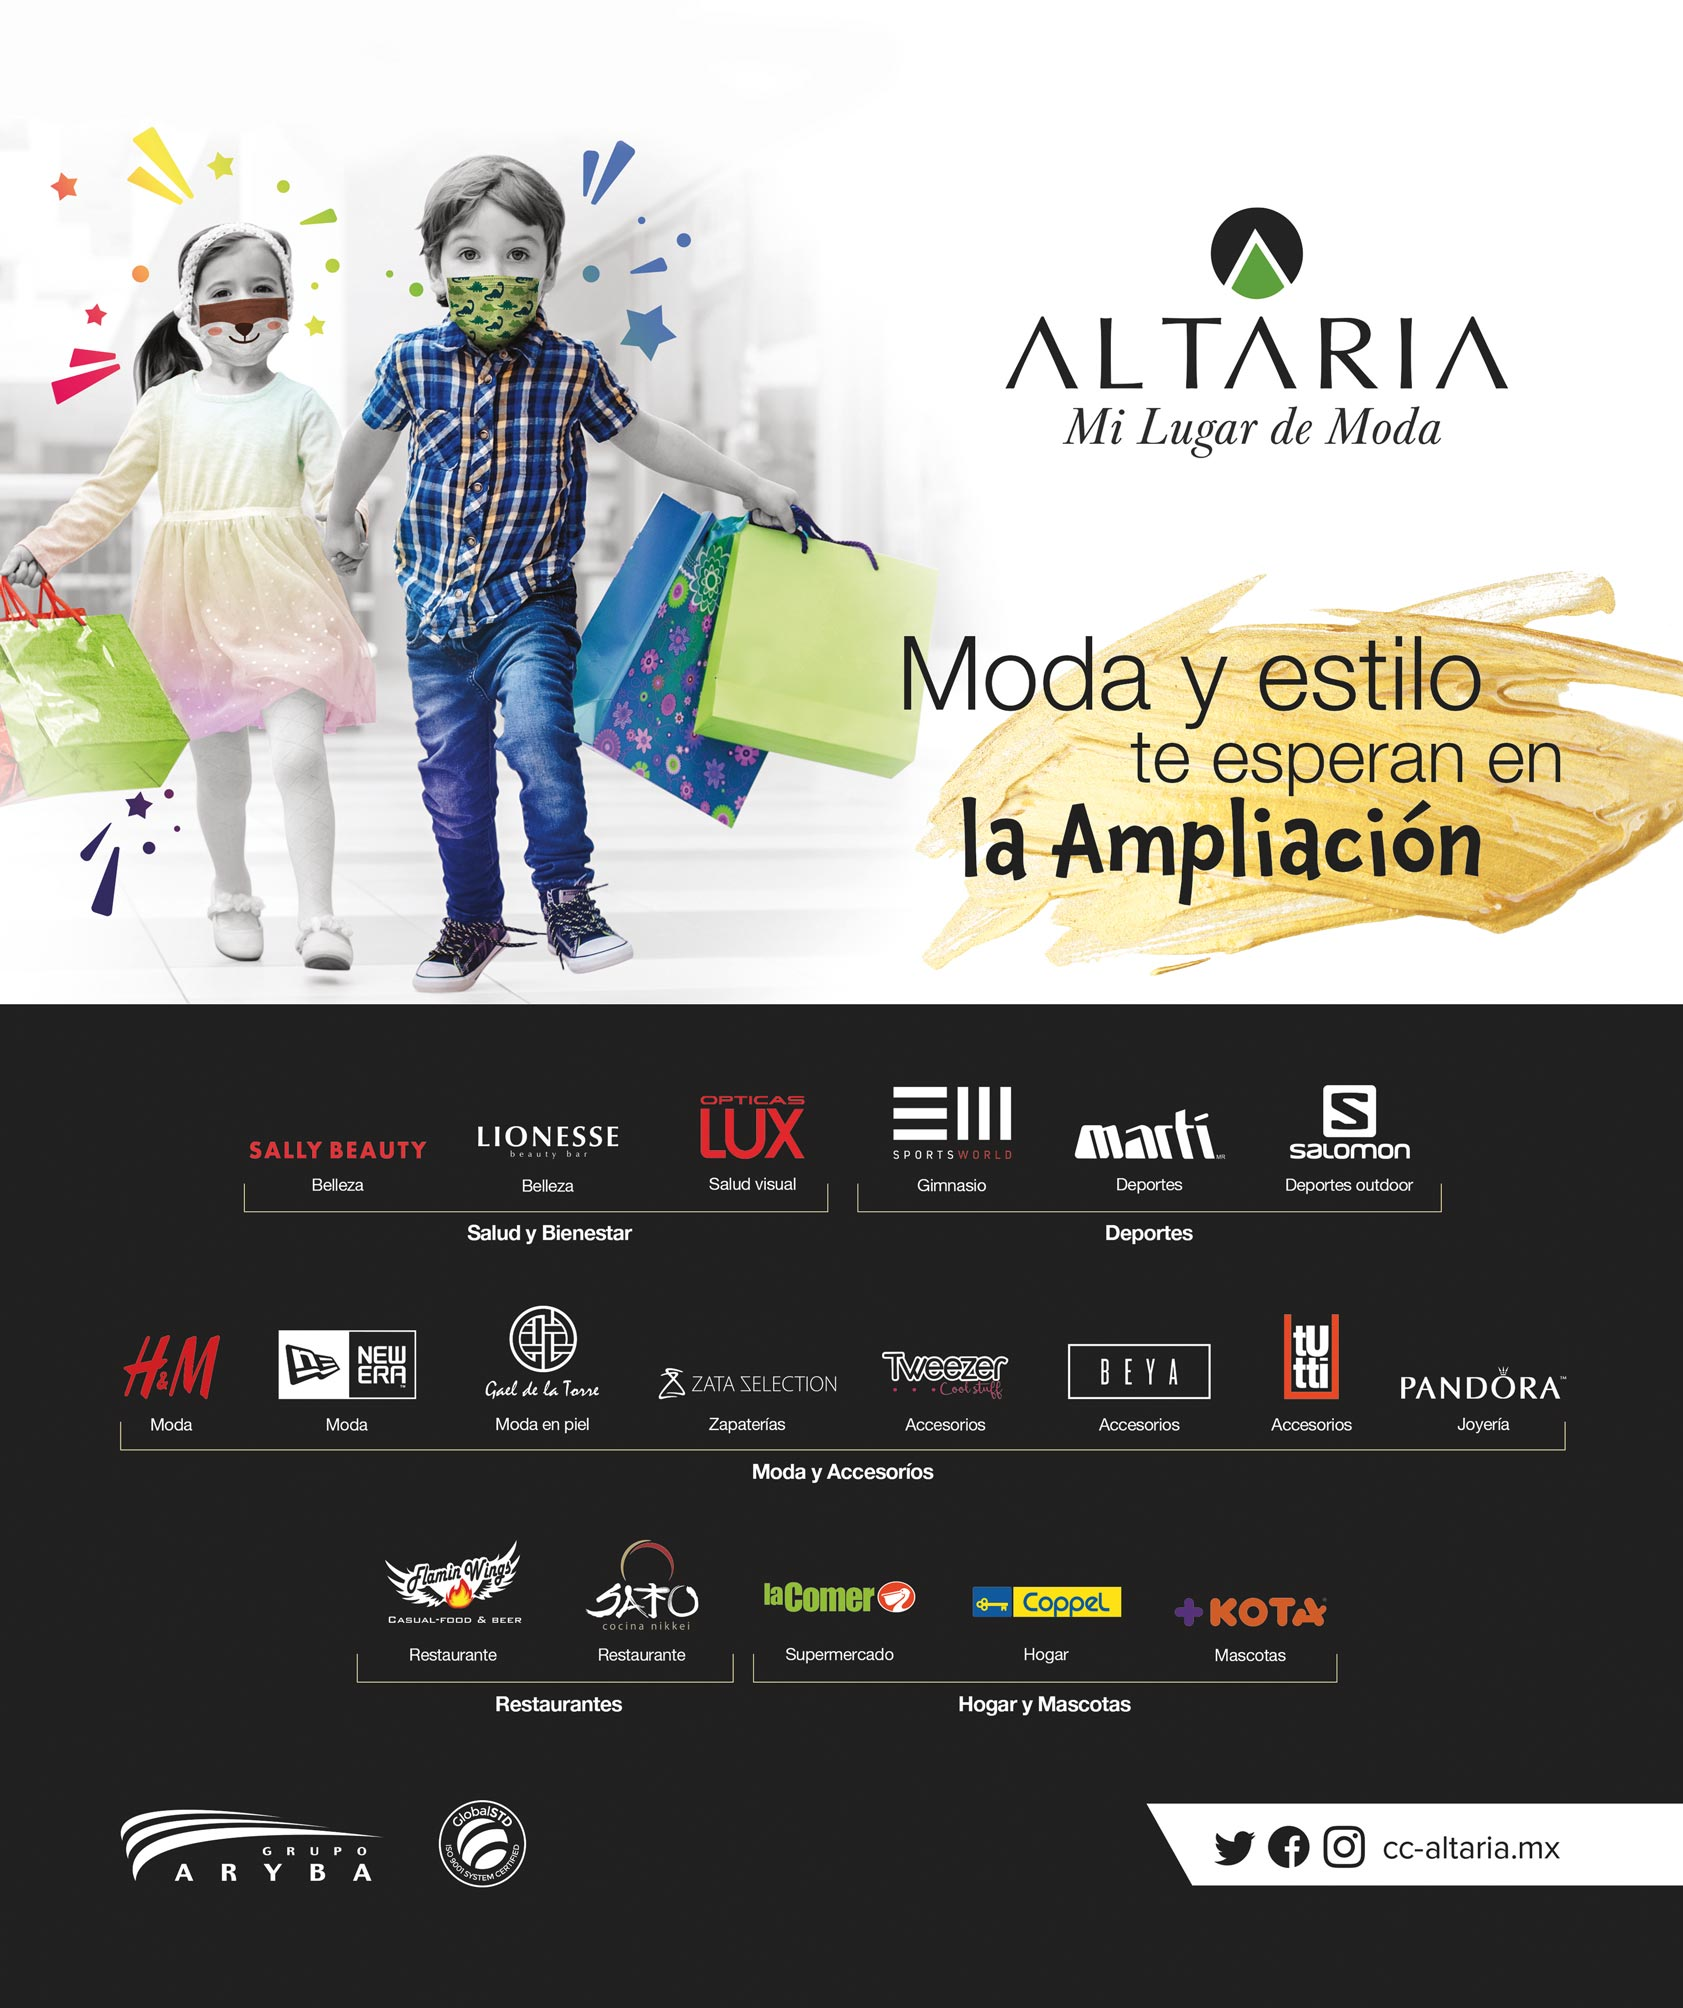 ALTARIA_CONTRA